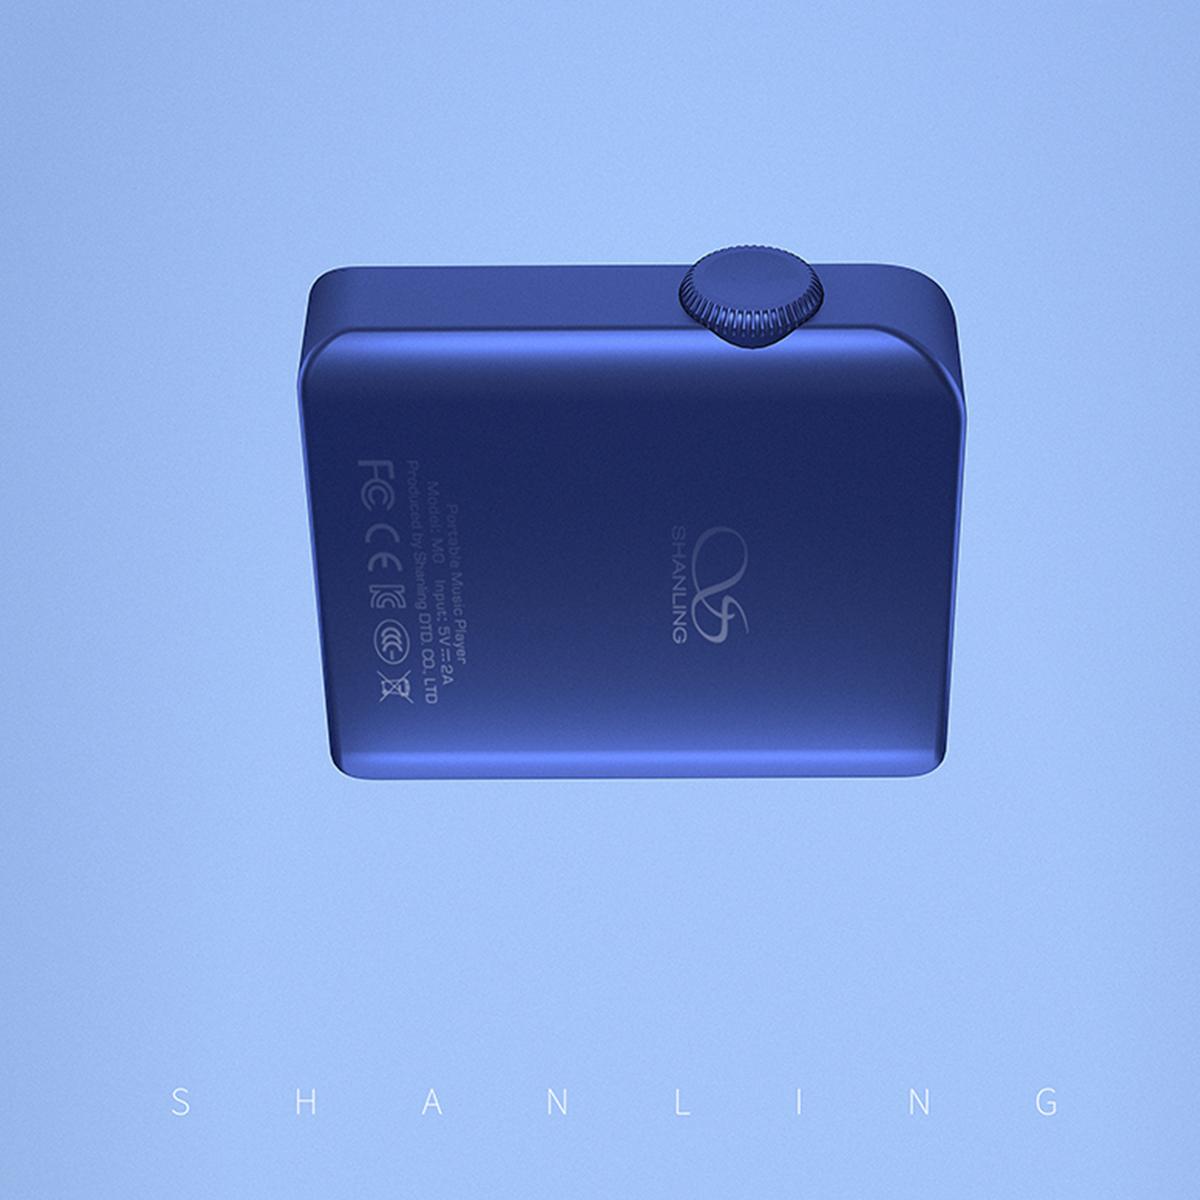 Shanling M0 azul